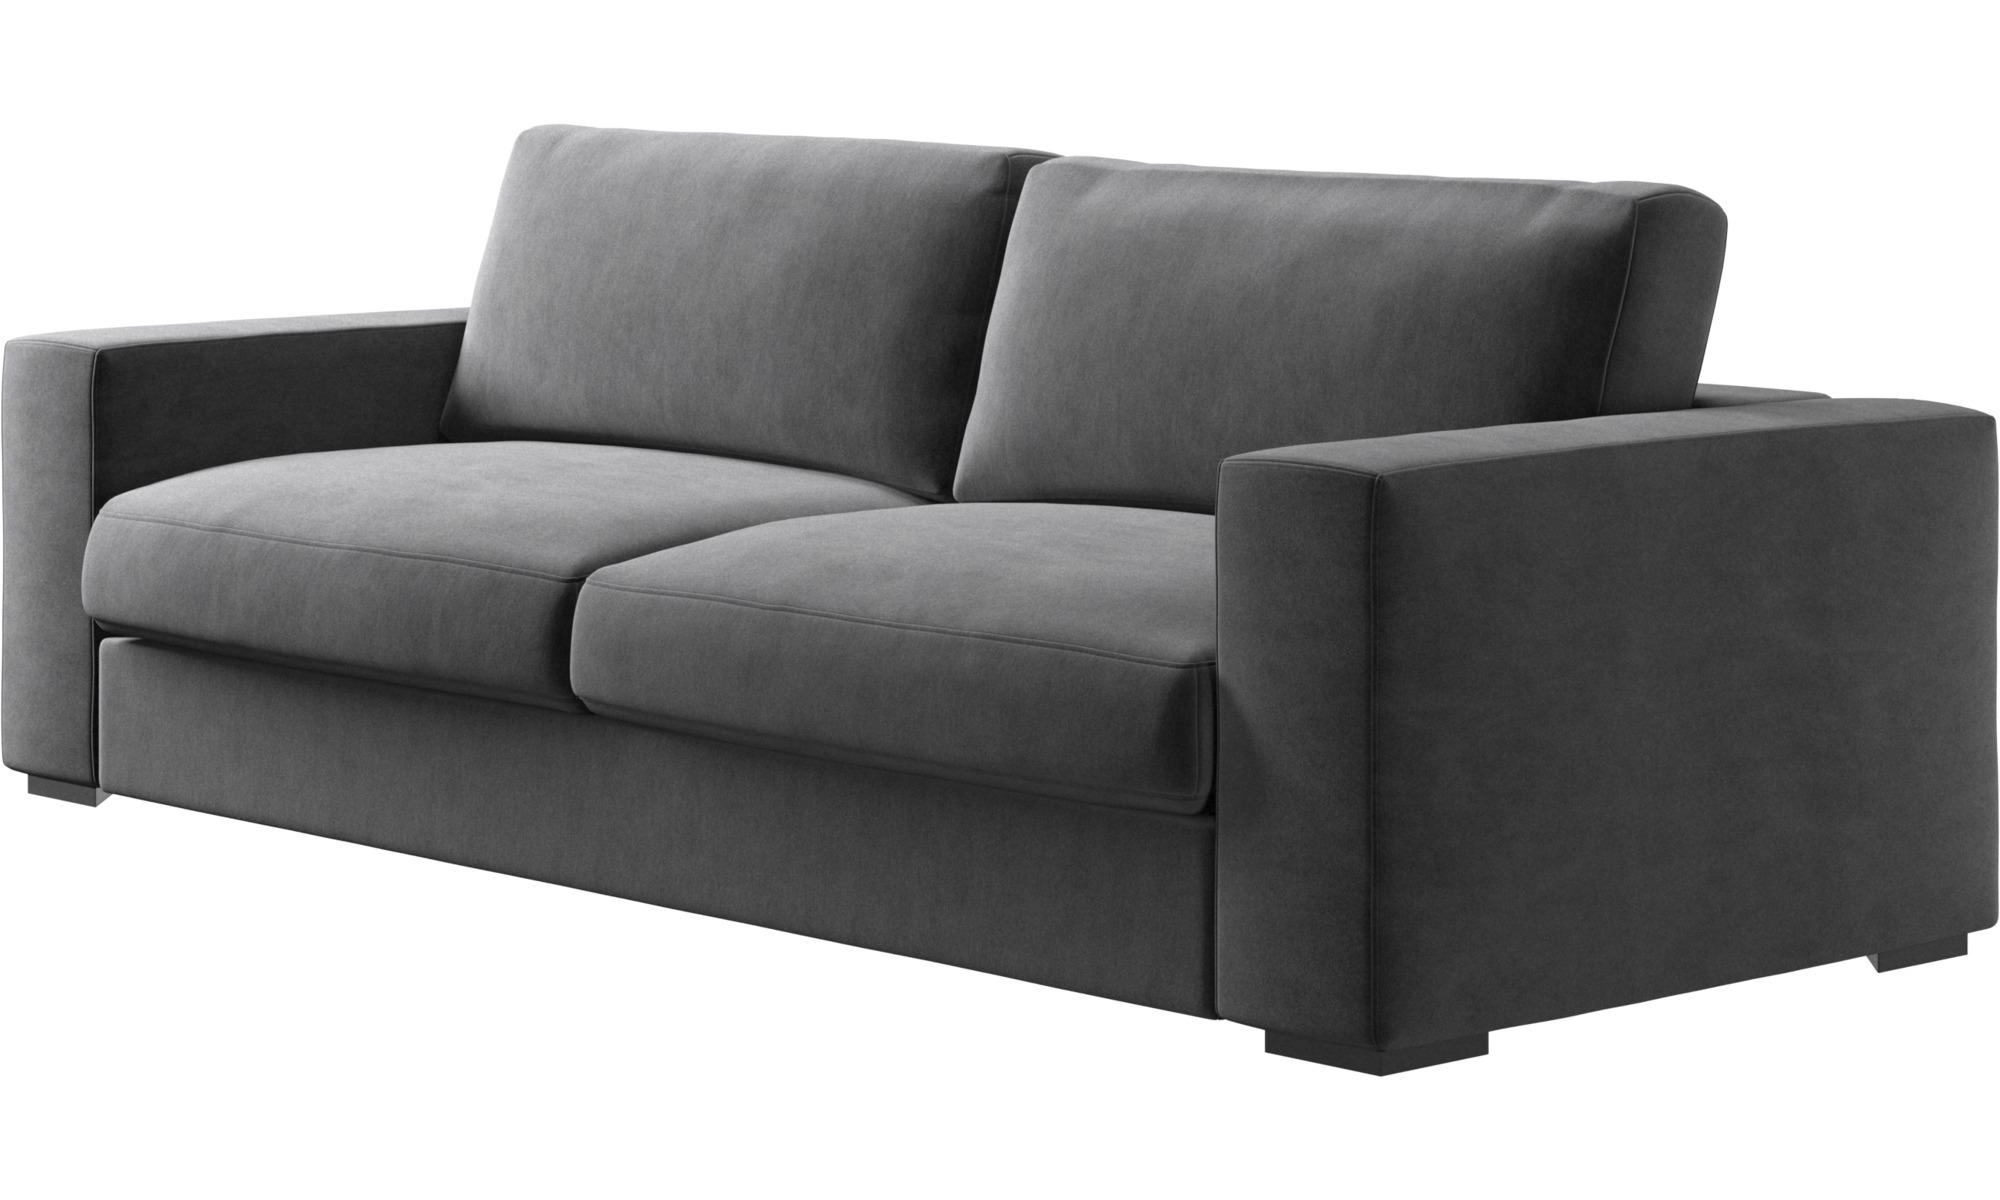 Full Size of Rattan Sofa 3 Sitzer Grau Louisiana (3 Sitzer Mit Polster Grau) Retro Kingsley 3 Sitzer Ikea Schlaffunktion Nino Schwarz/grau Couch 2 Und Leder Samt Sofas Sofa Sofa 3 Sitzer Grau